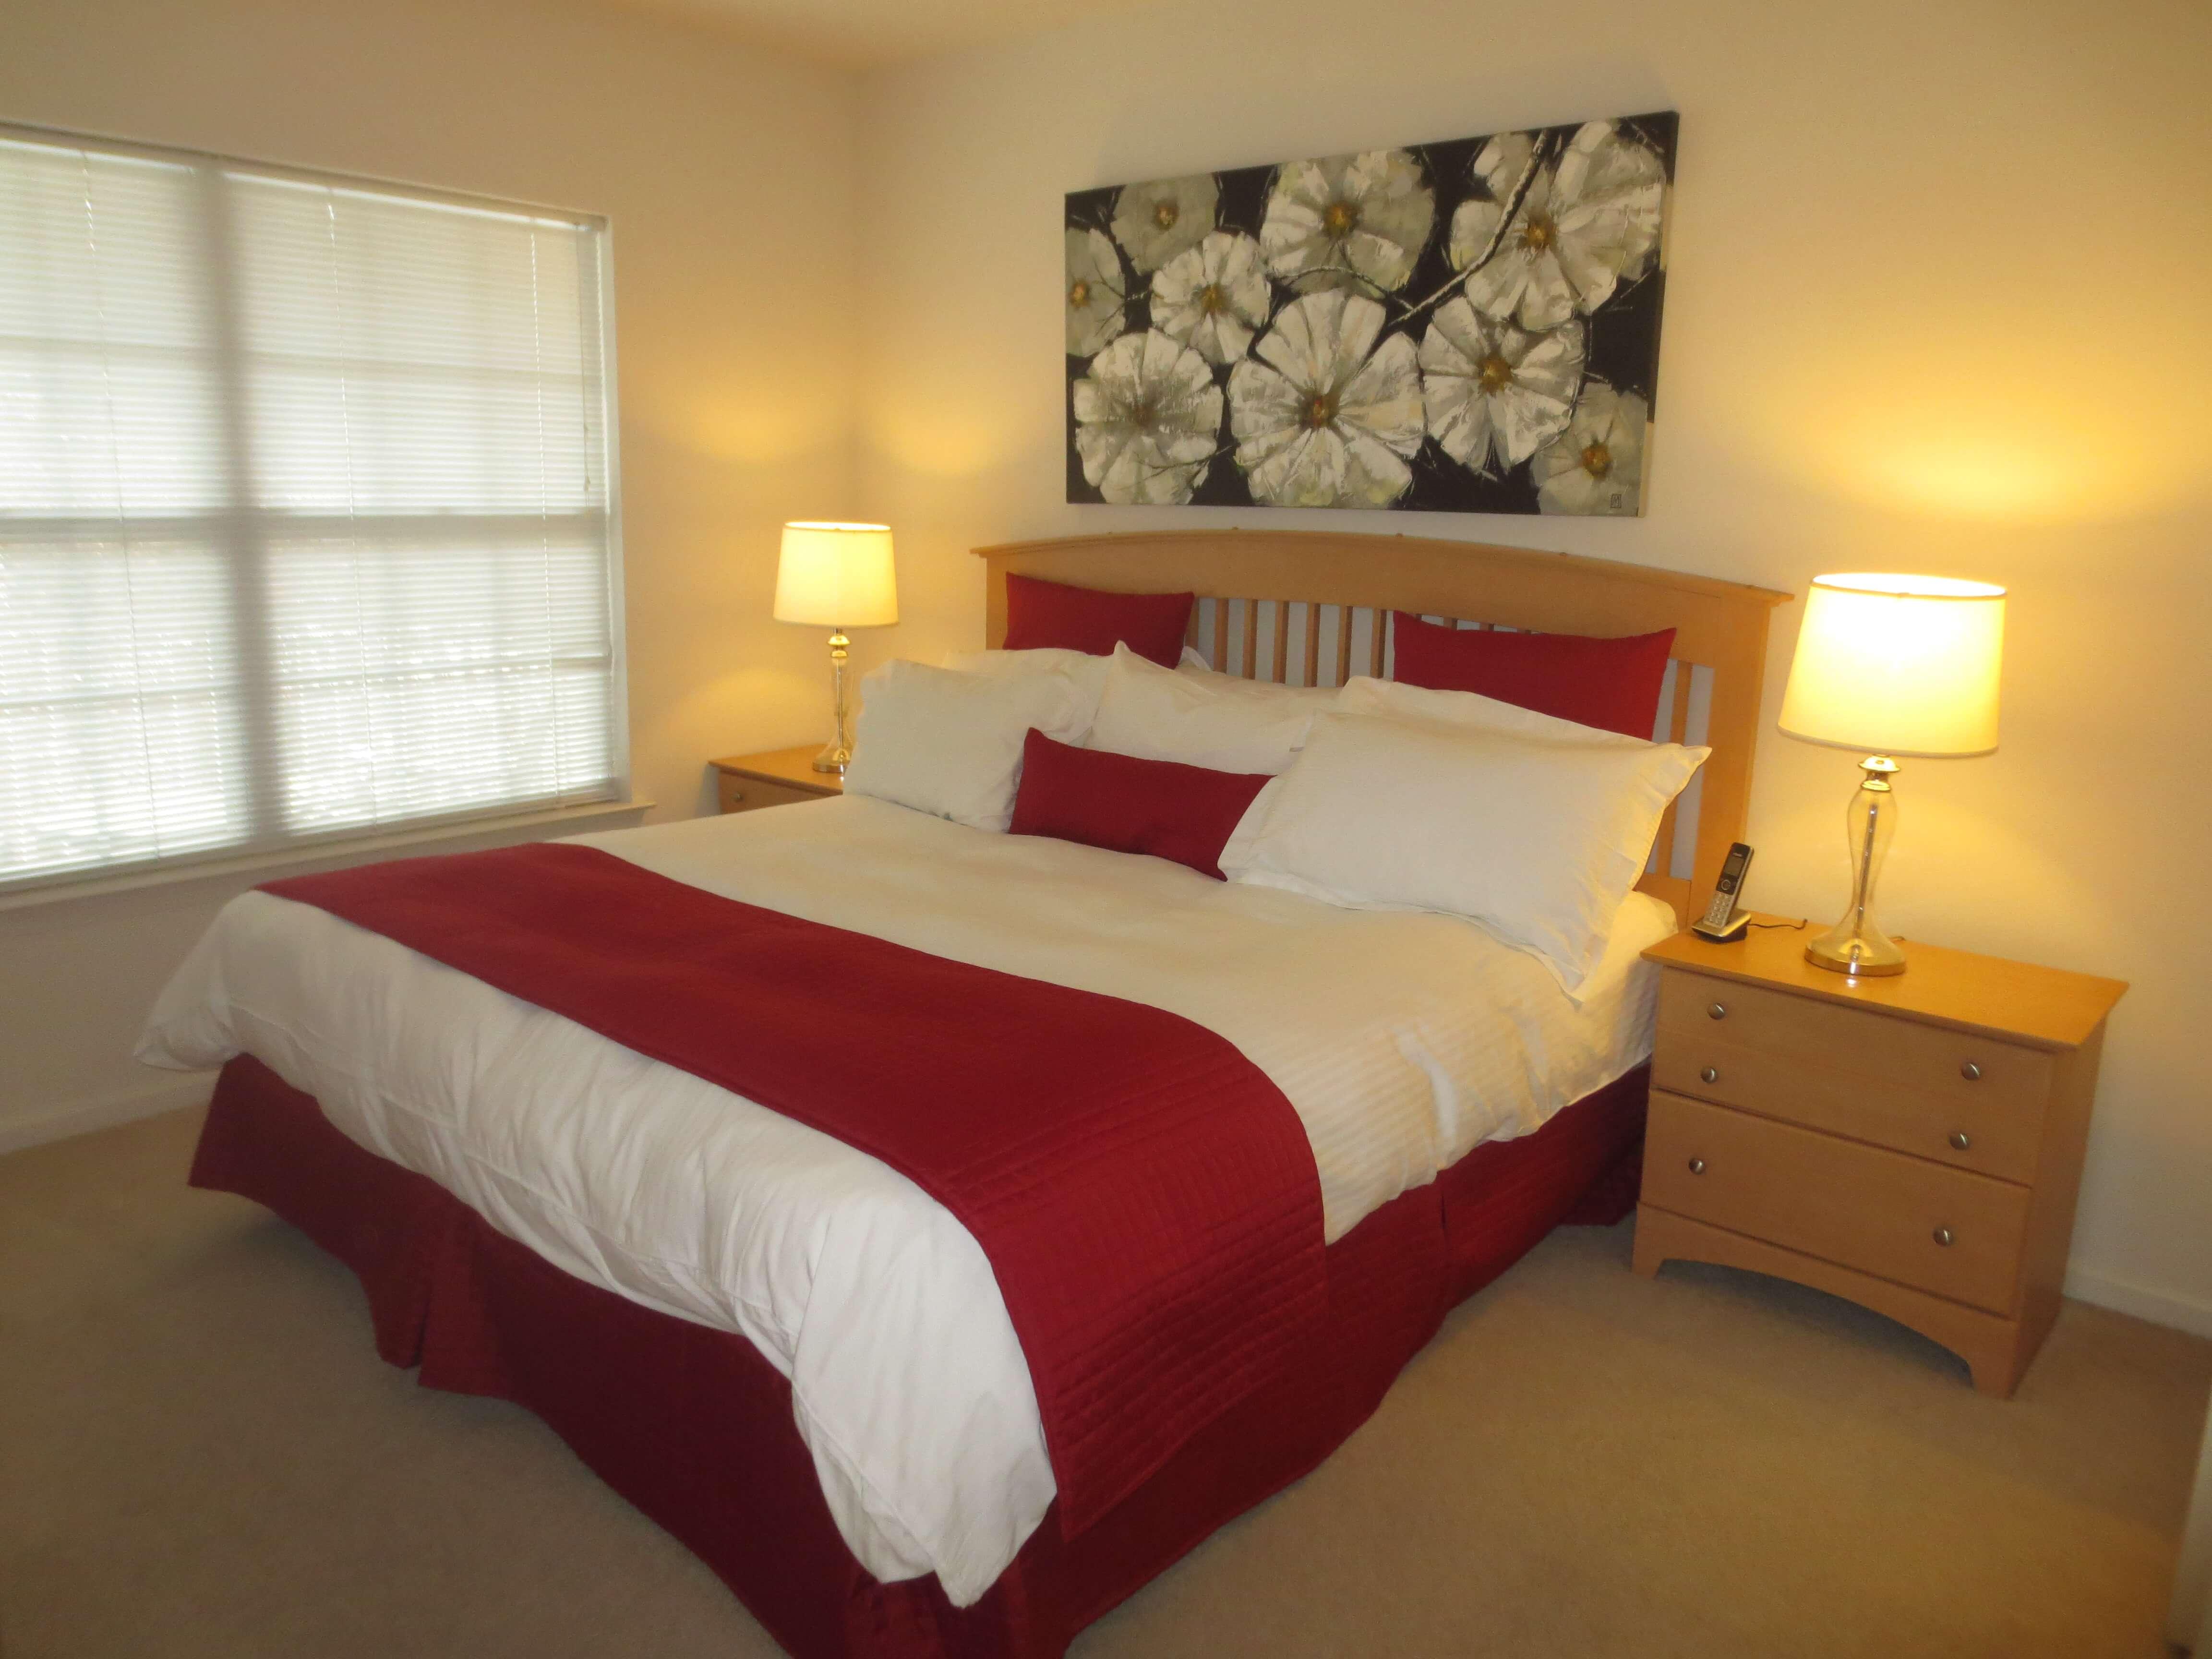 1 Bedroom Apartments In Nj 28 Images 1 Bedroom